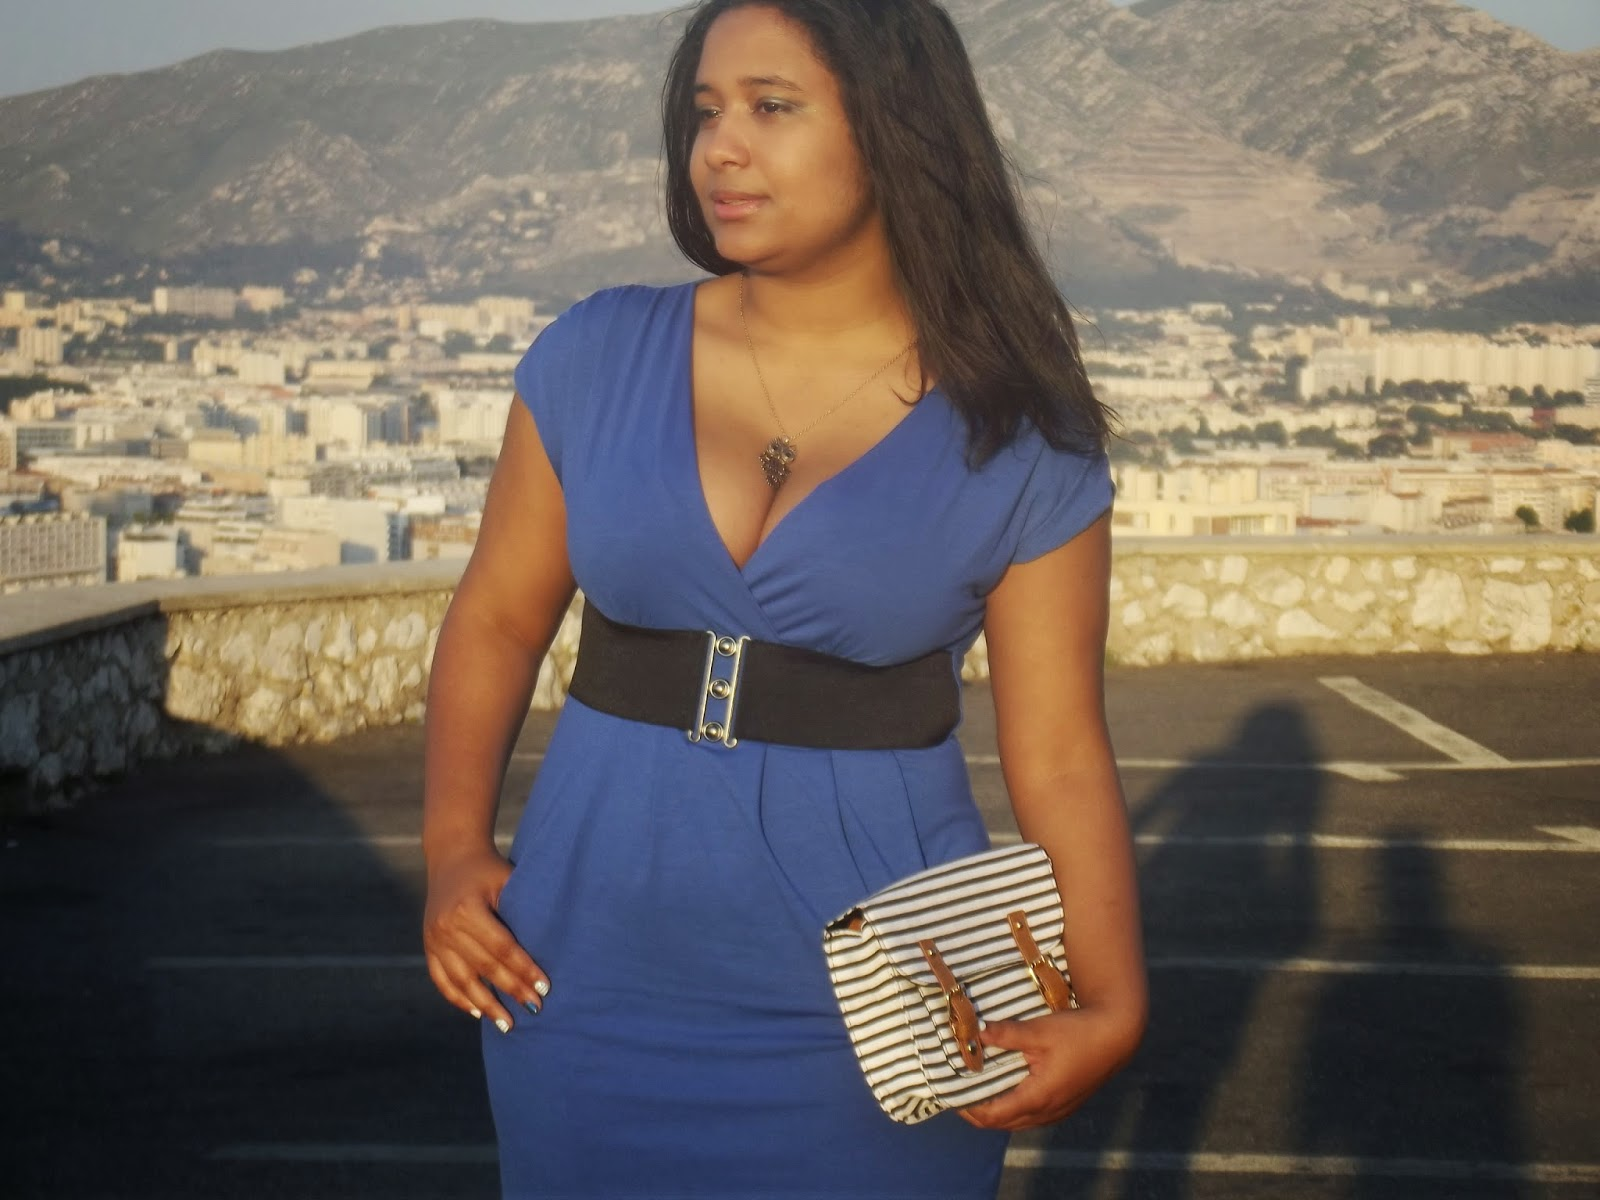 http://la-petite-mariniere.blogspot.fr/2014/08/blue-sky.html